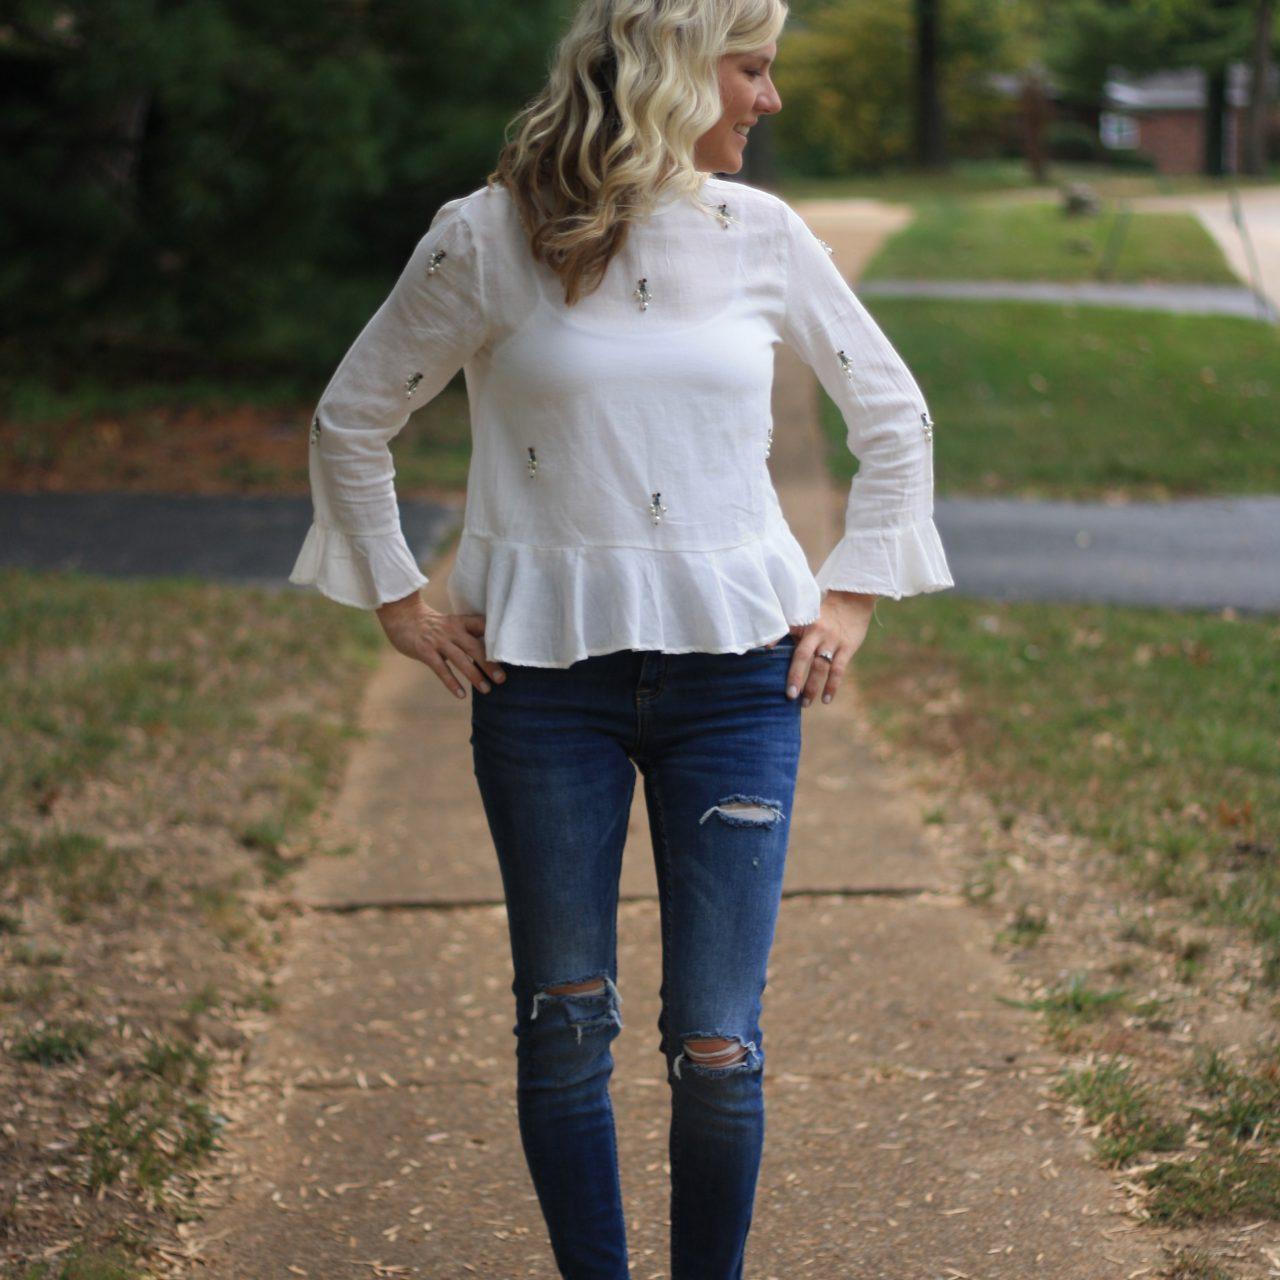 Step Hem Jeans – My Top Picks